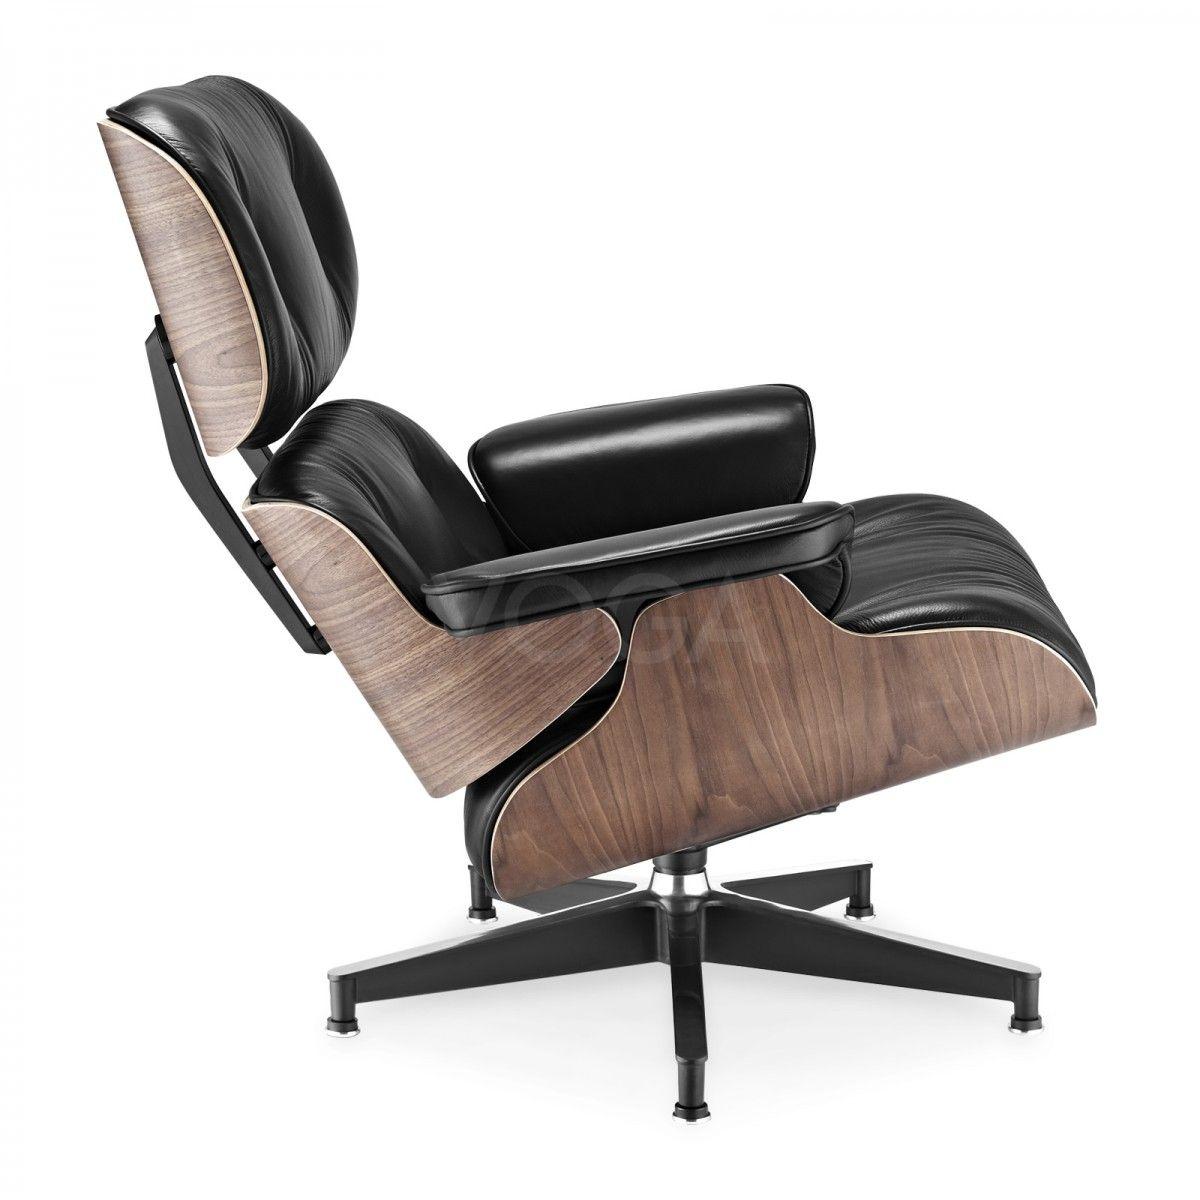 Eames lounge chair replica designersessel voga for Design stuhl replik